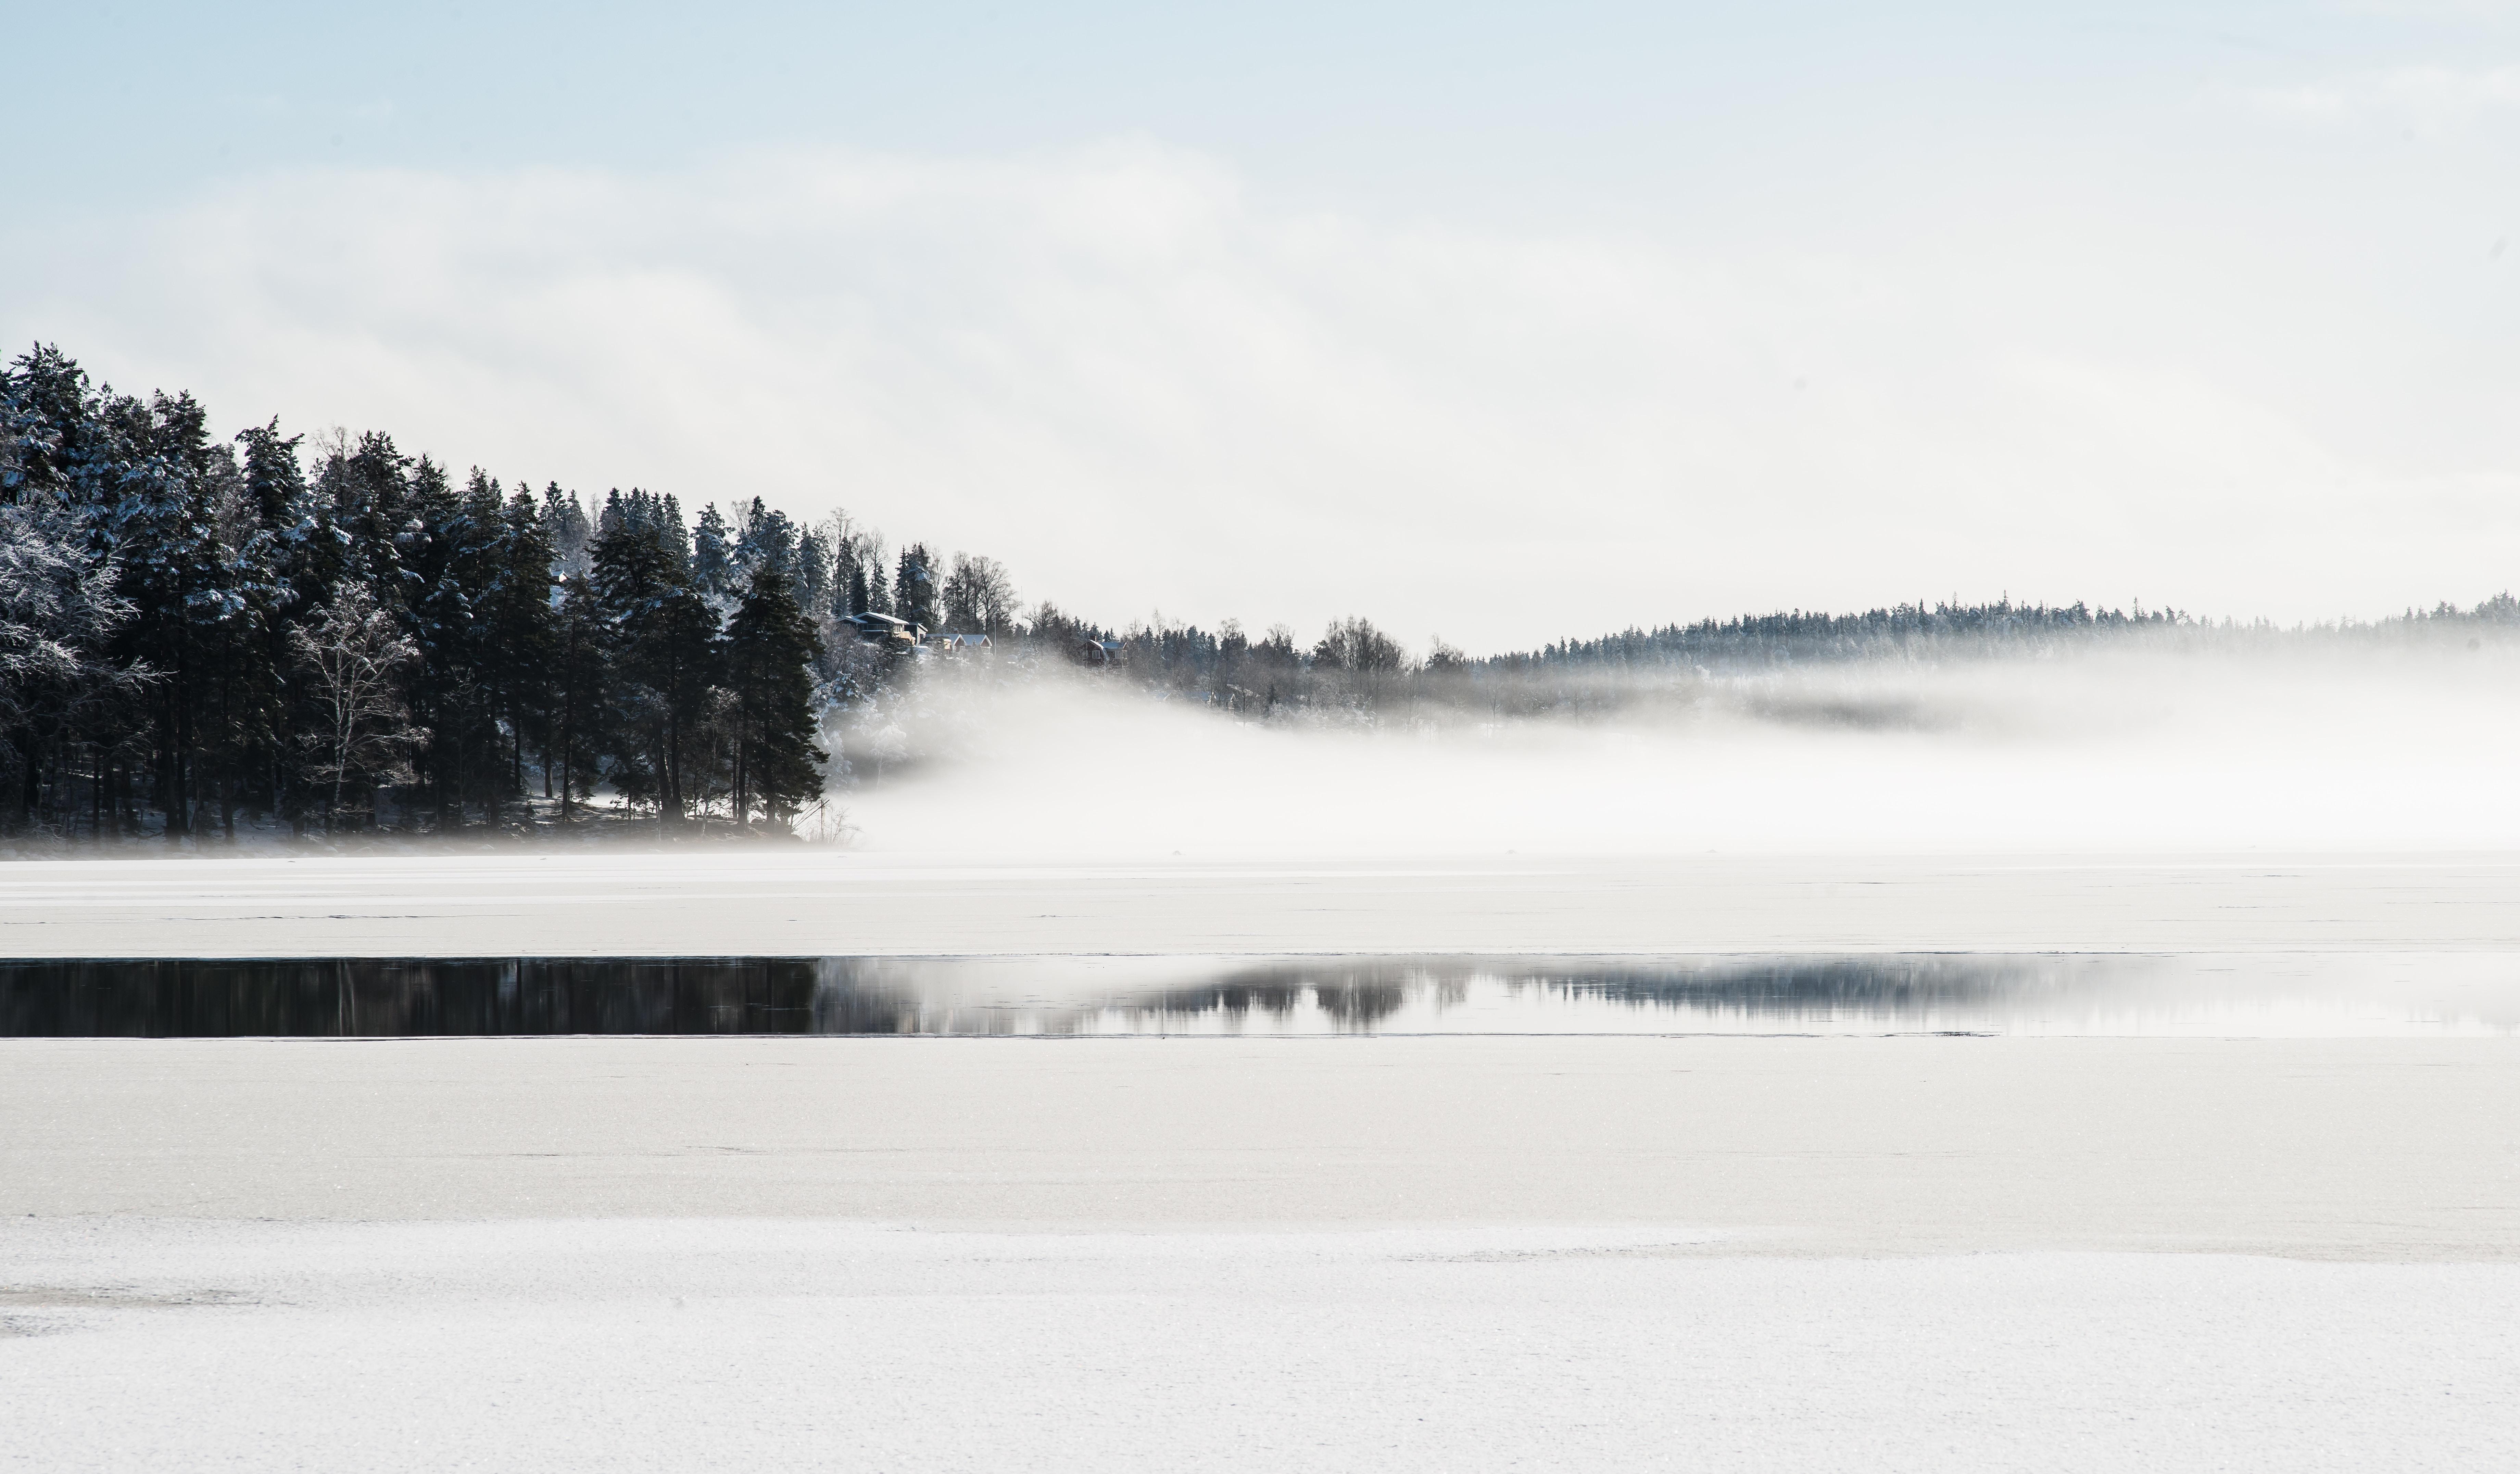 body of water near pine trees